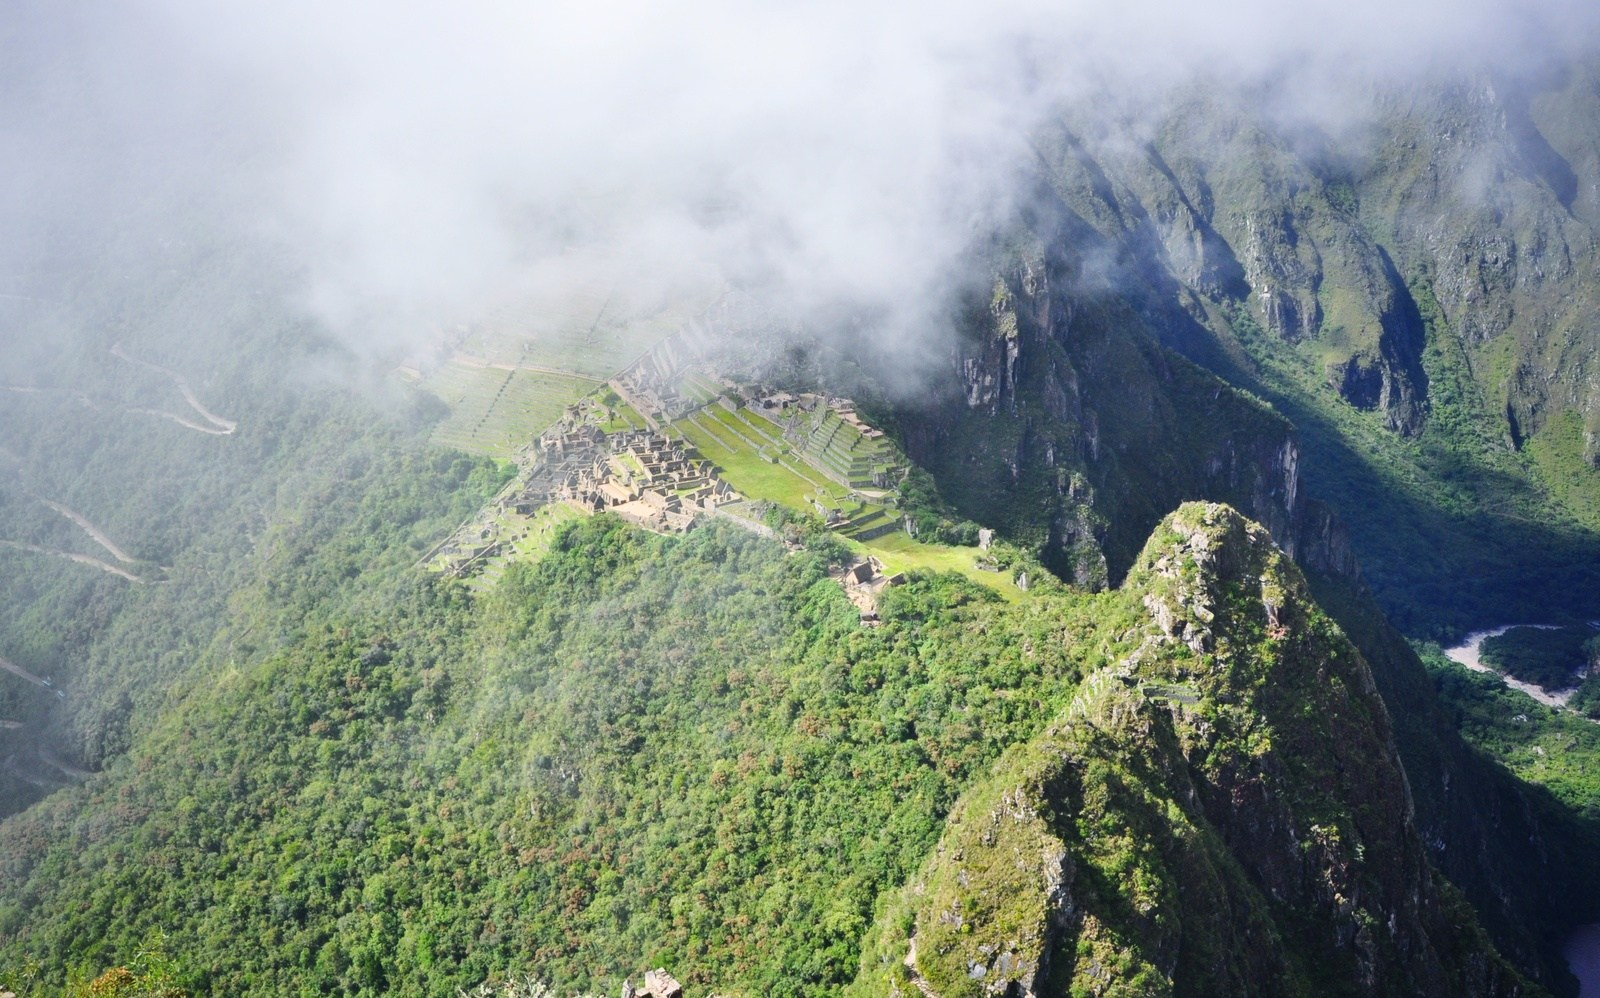 Vue à partir de Wayna Picchu Huayna Picchu